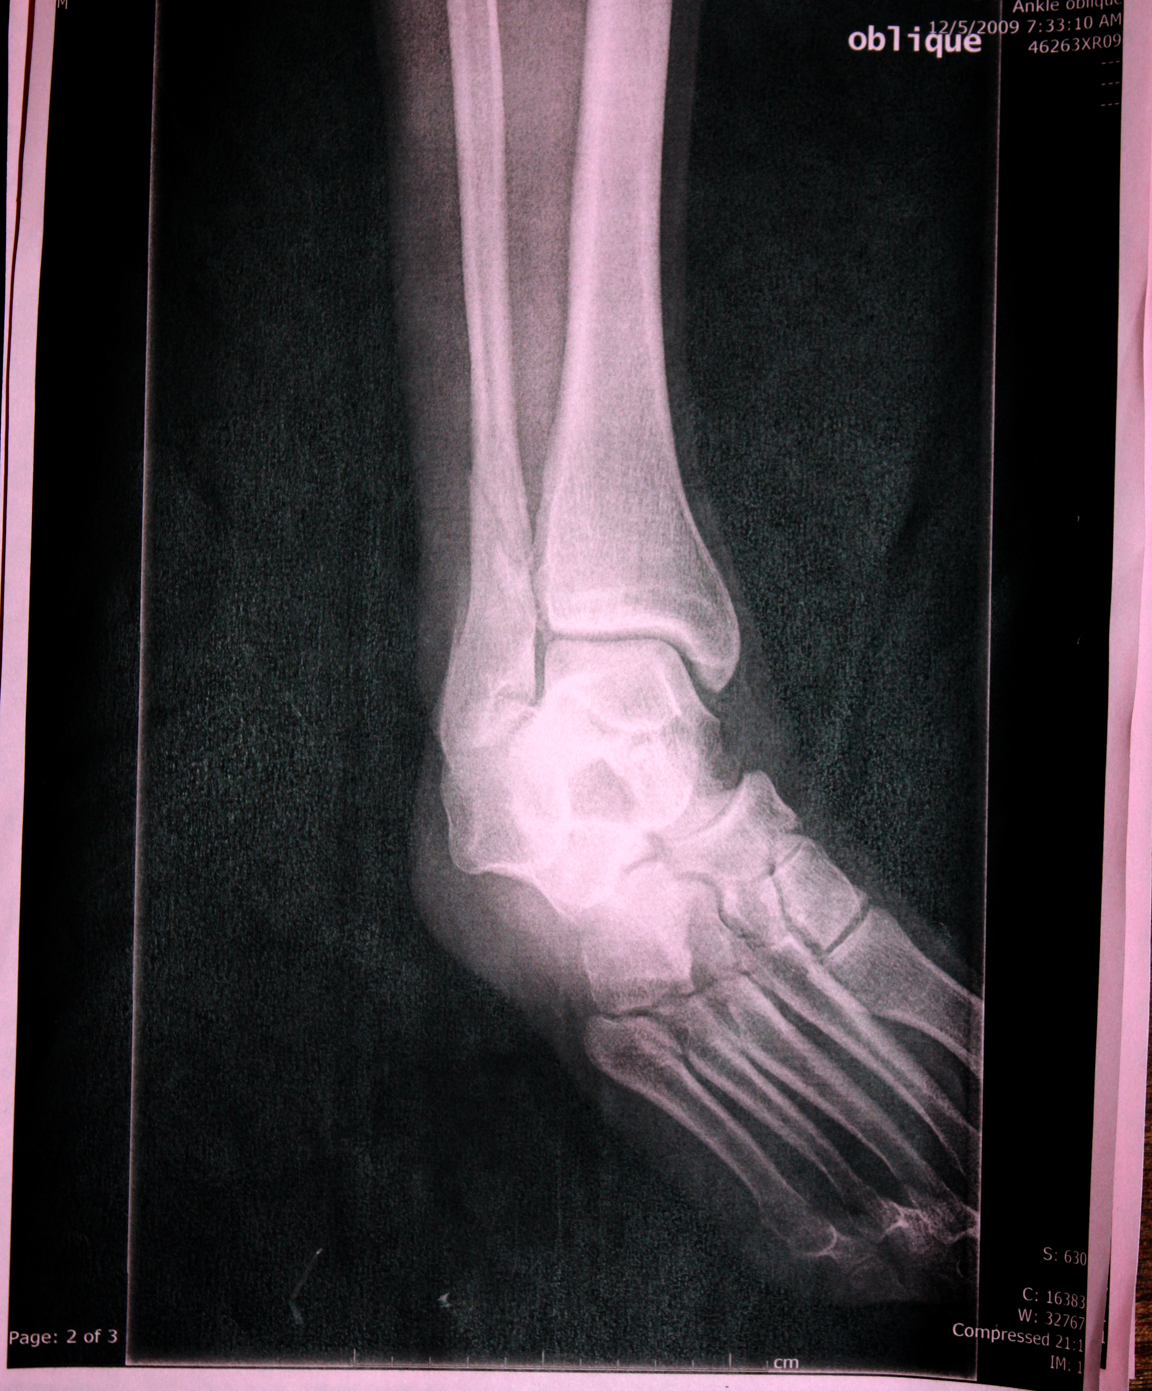 Broke My Leg